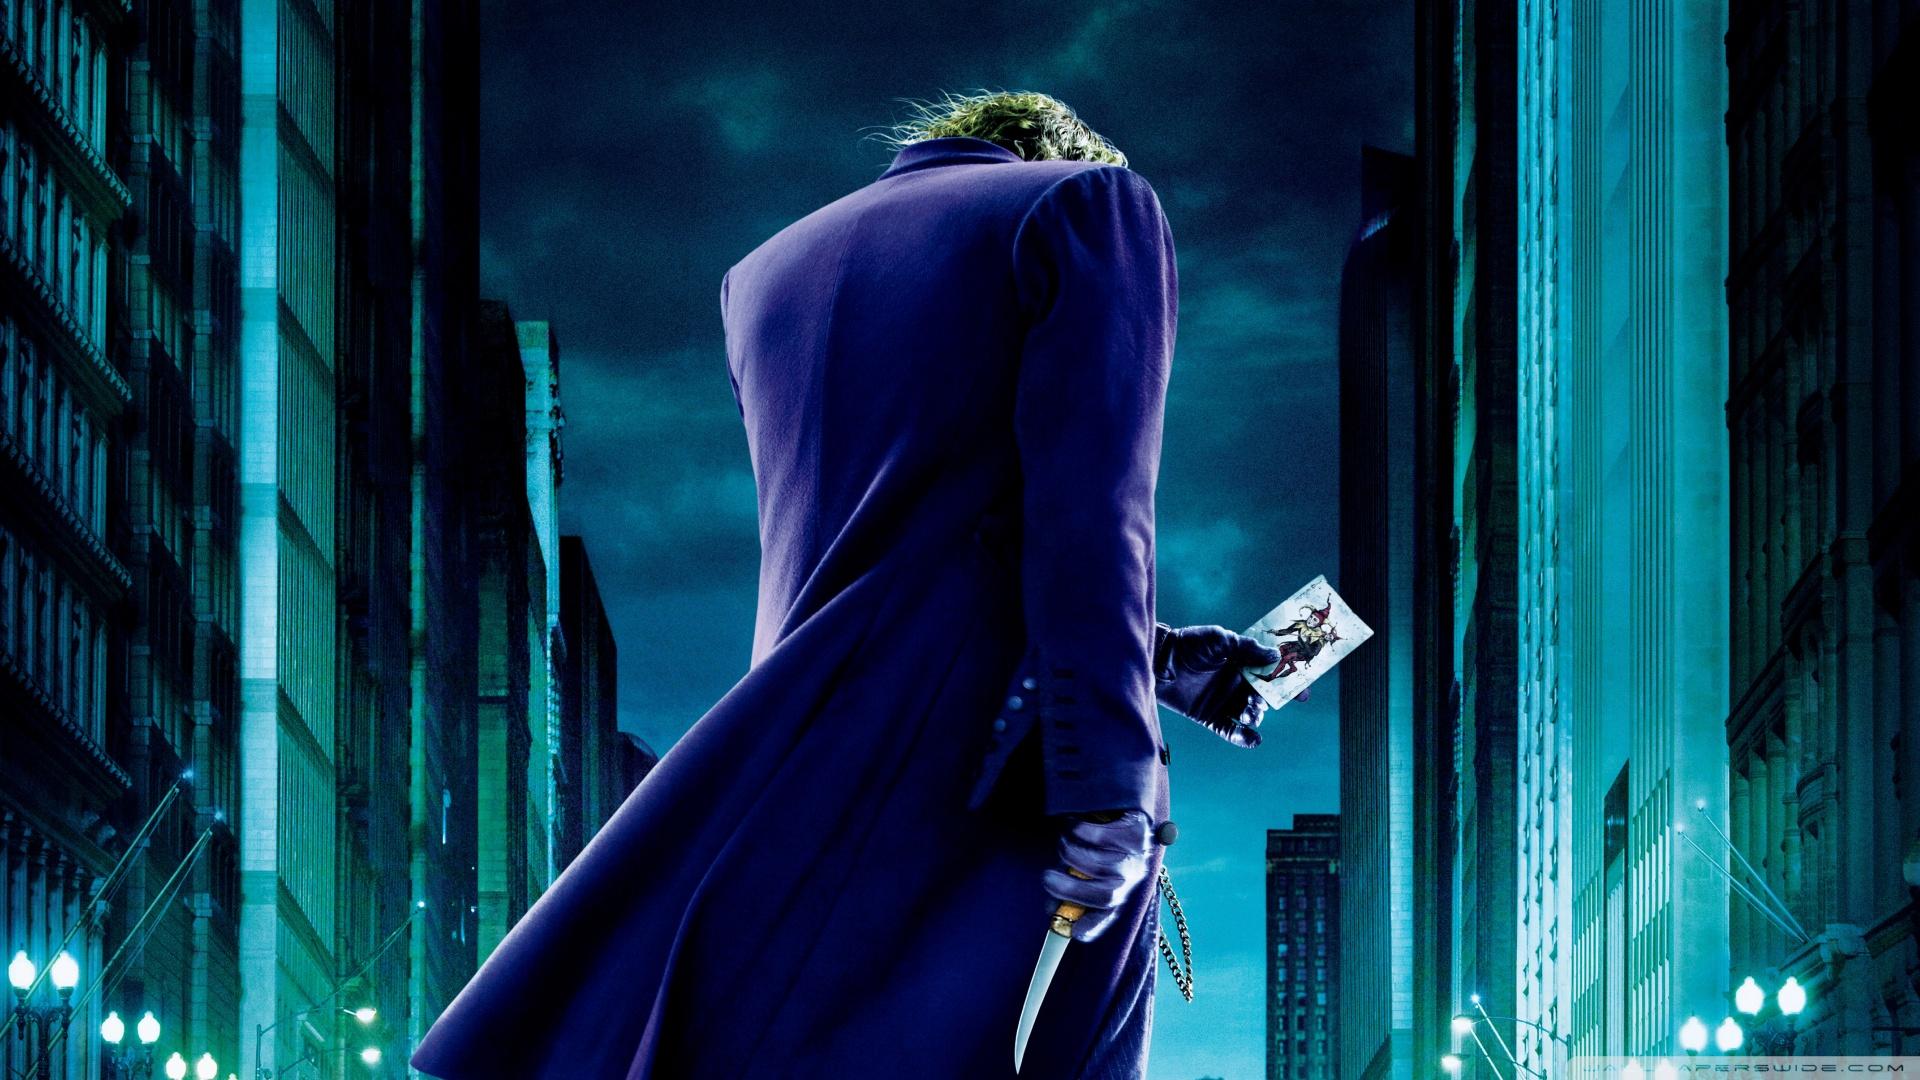 Free Download The Joker The Dark Knight Wallpaper 1920x1080 The Joker The Dark 1920x1080 For Your Desktop Mobile Tablet Explore 74 The Dark Knight Joker Wallpaper The Dark Knight